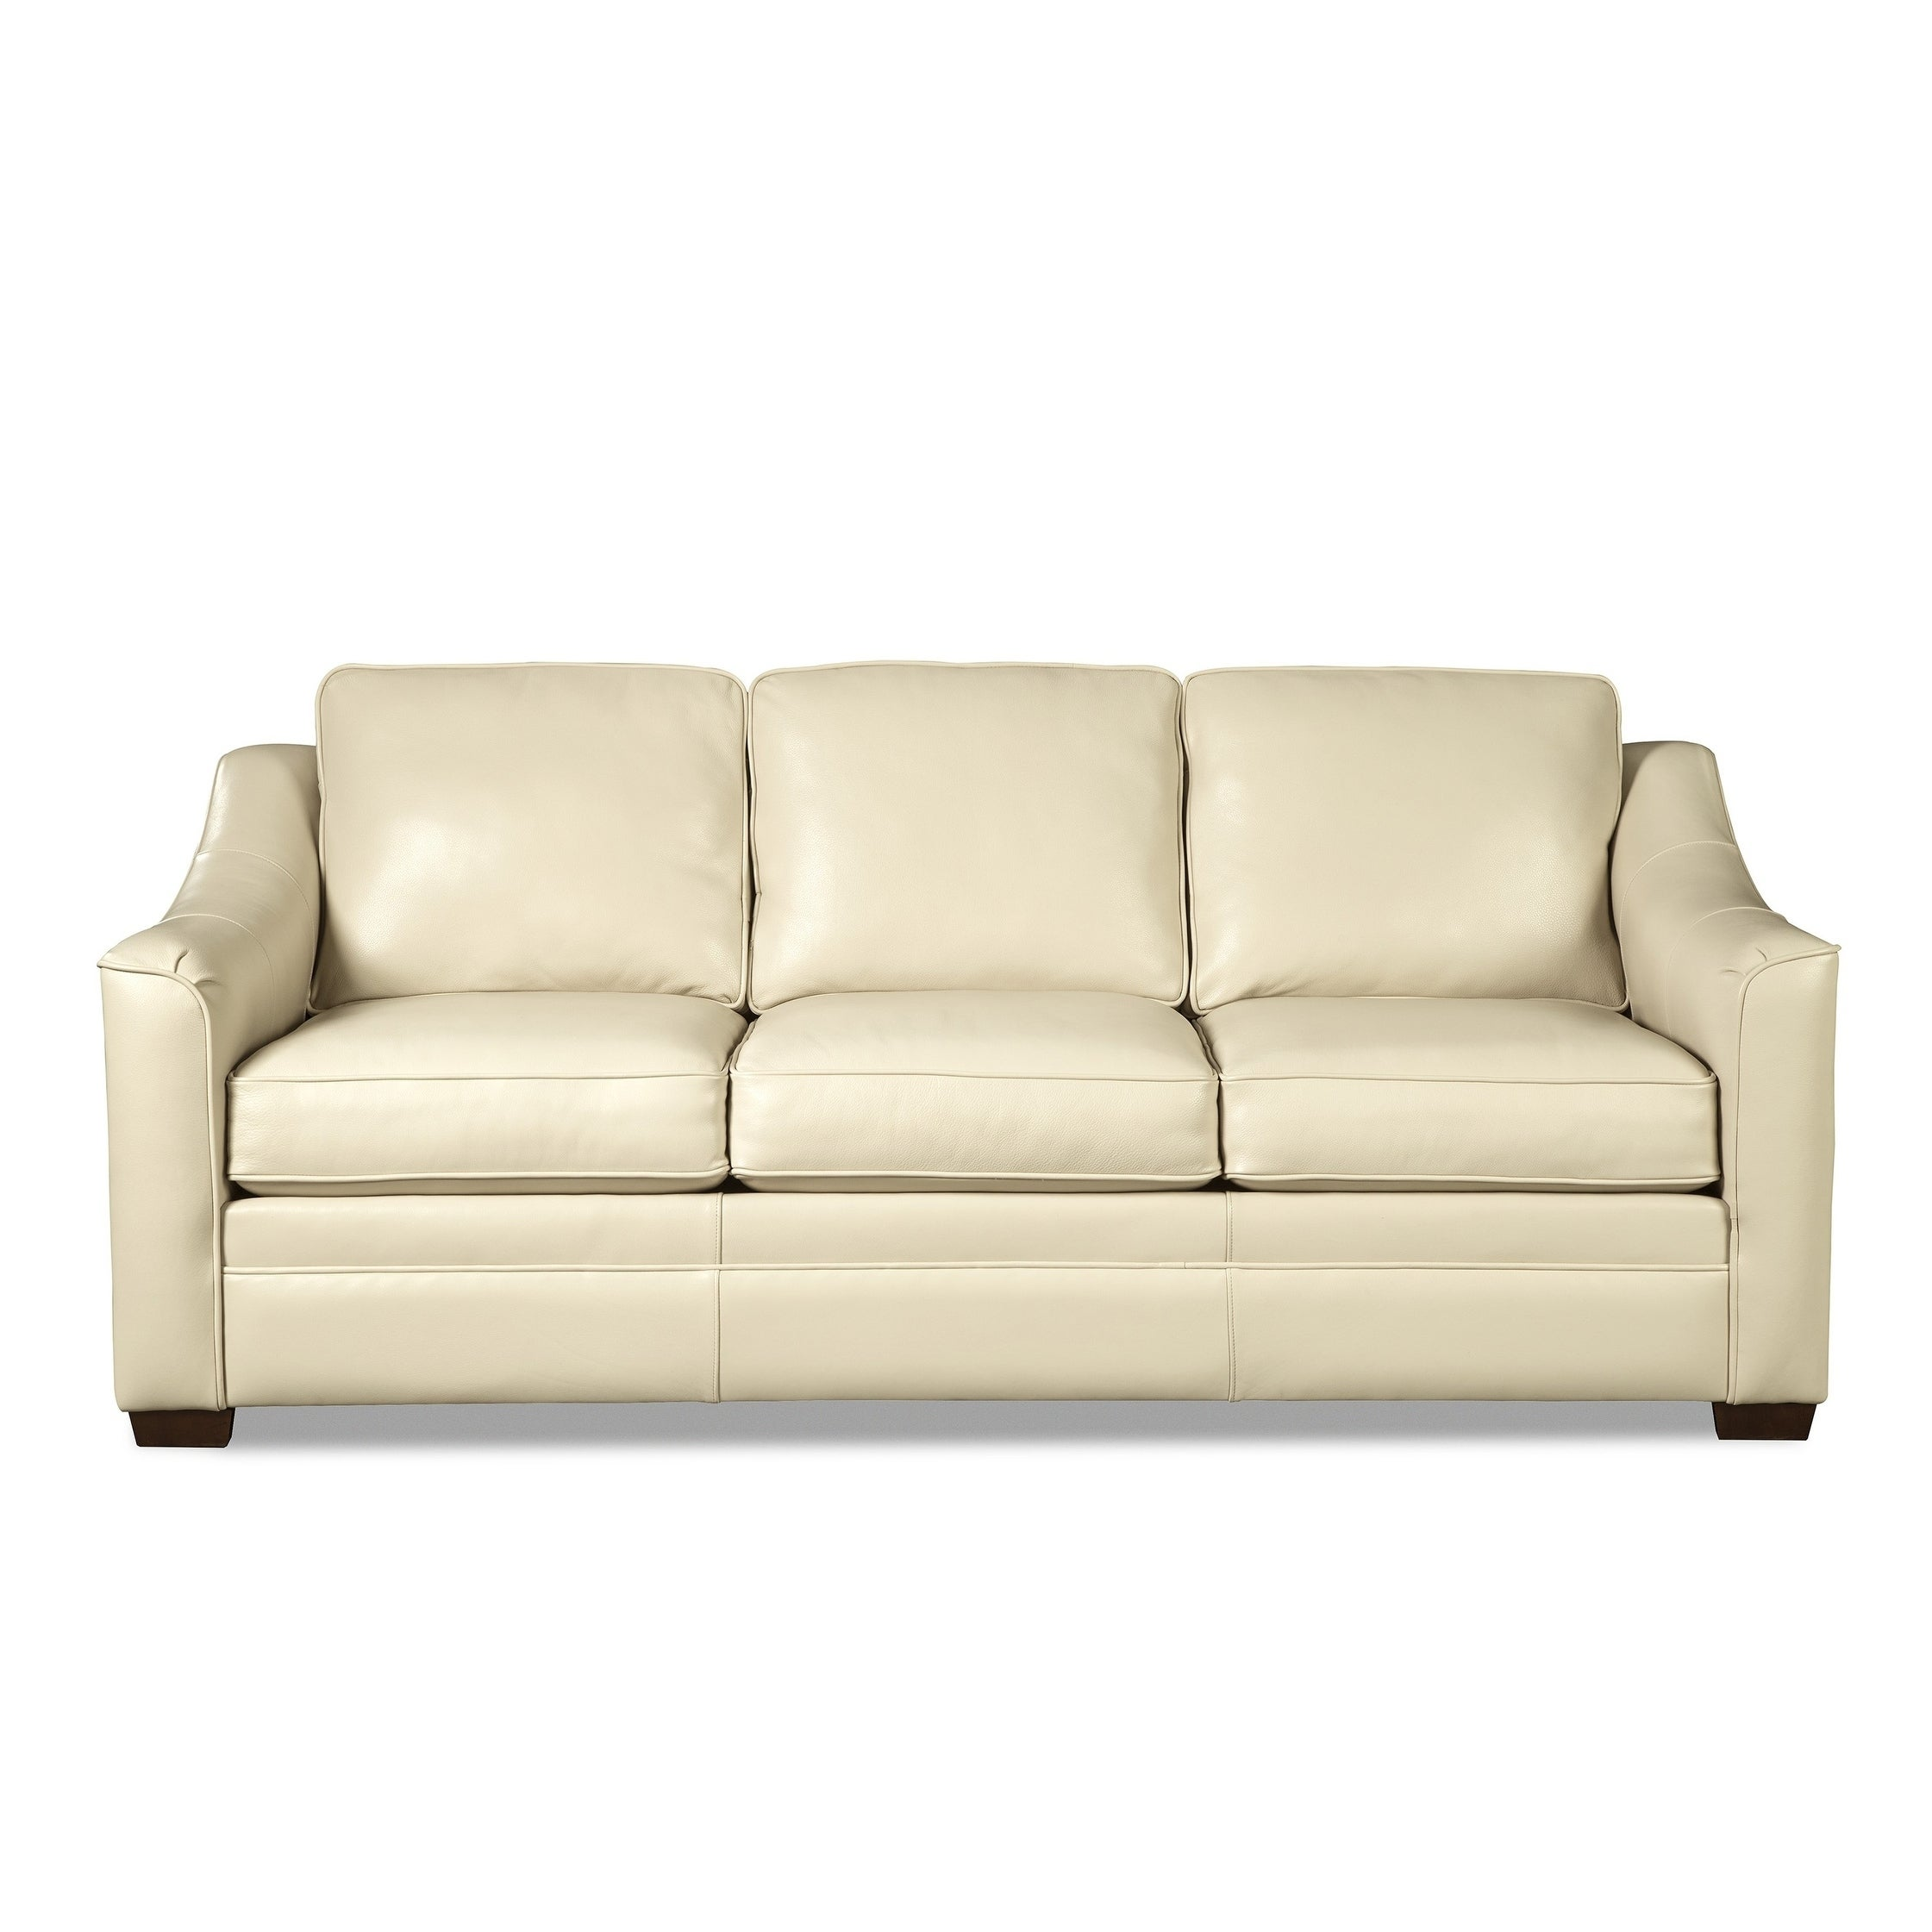 - Shop Horseshoe Memory Foam Queen Sleeper Sofa - On Sale